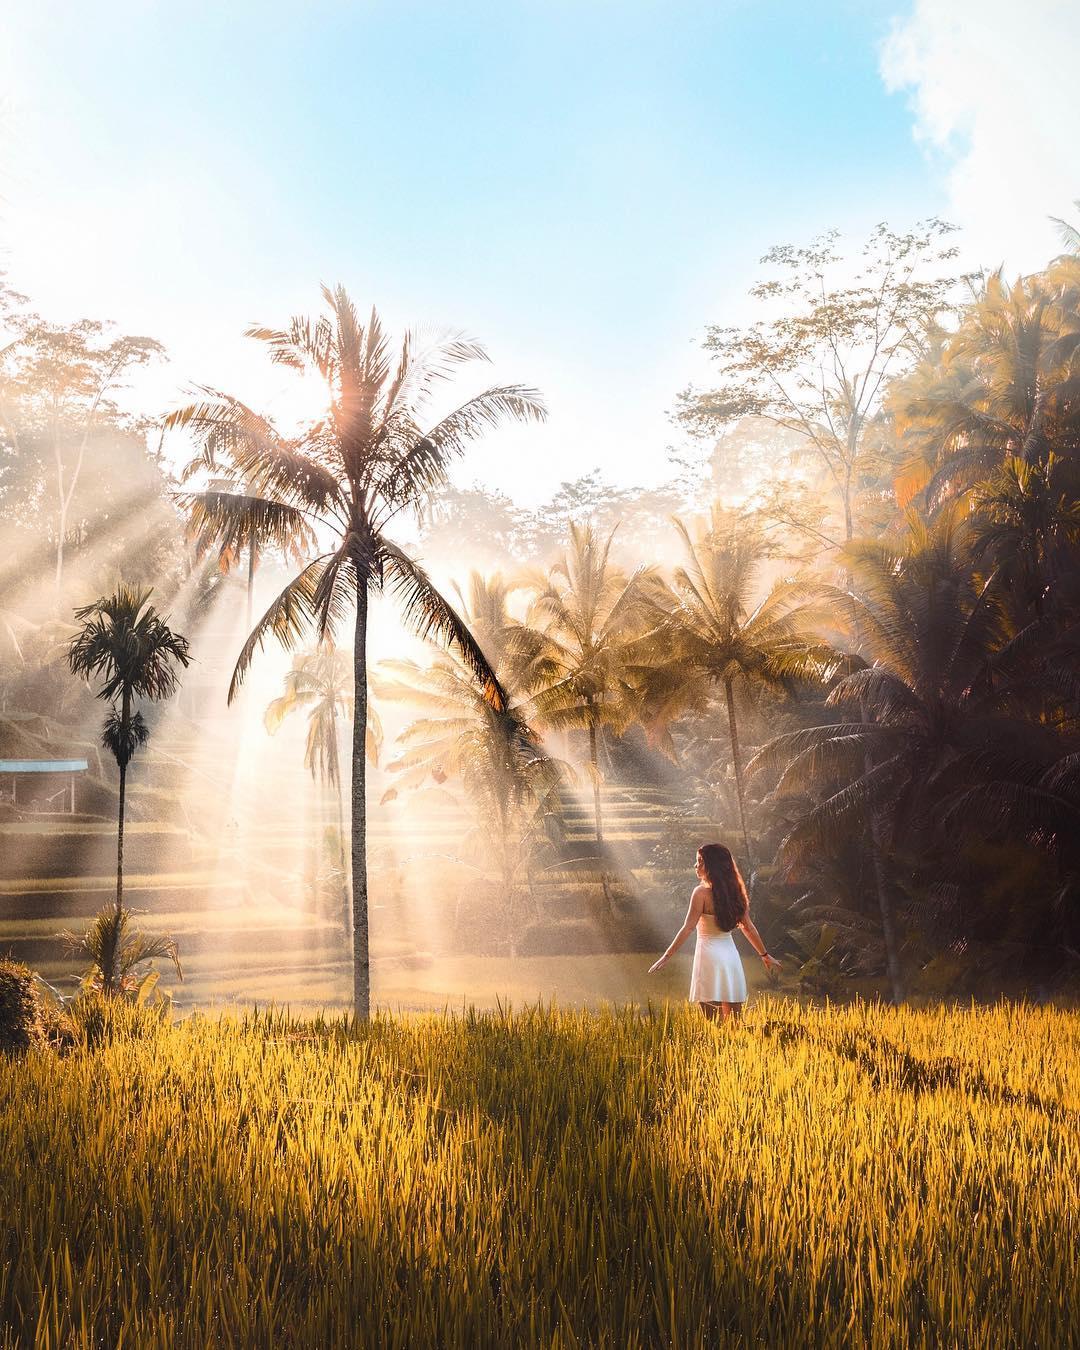 Красивые снимки из путешествий Джордана Хаммонда